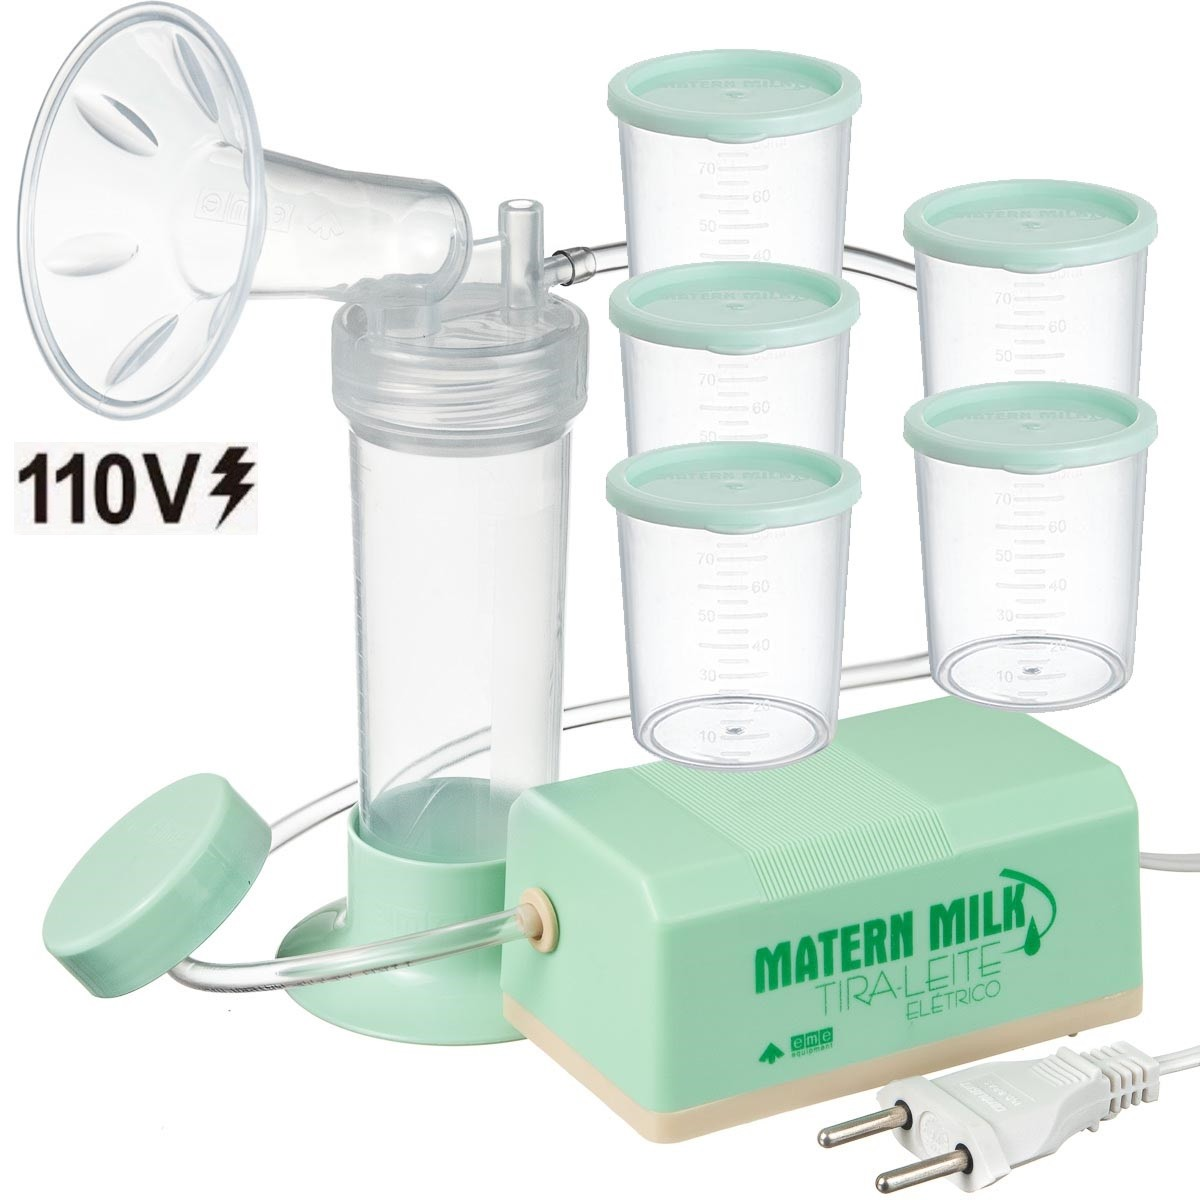 Bomba tira leite elétrico 110 V Verde - Matern Milk +5 Copos